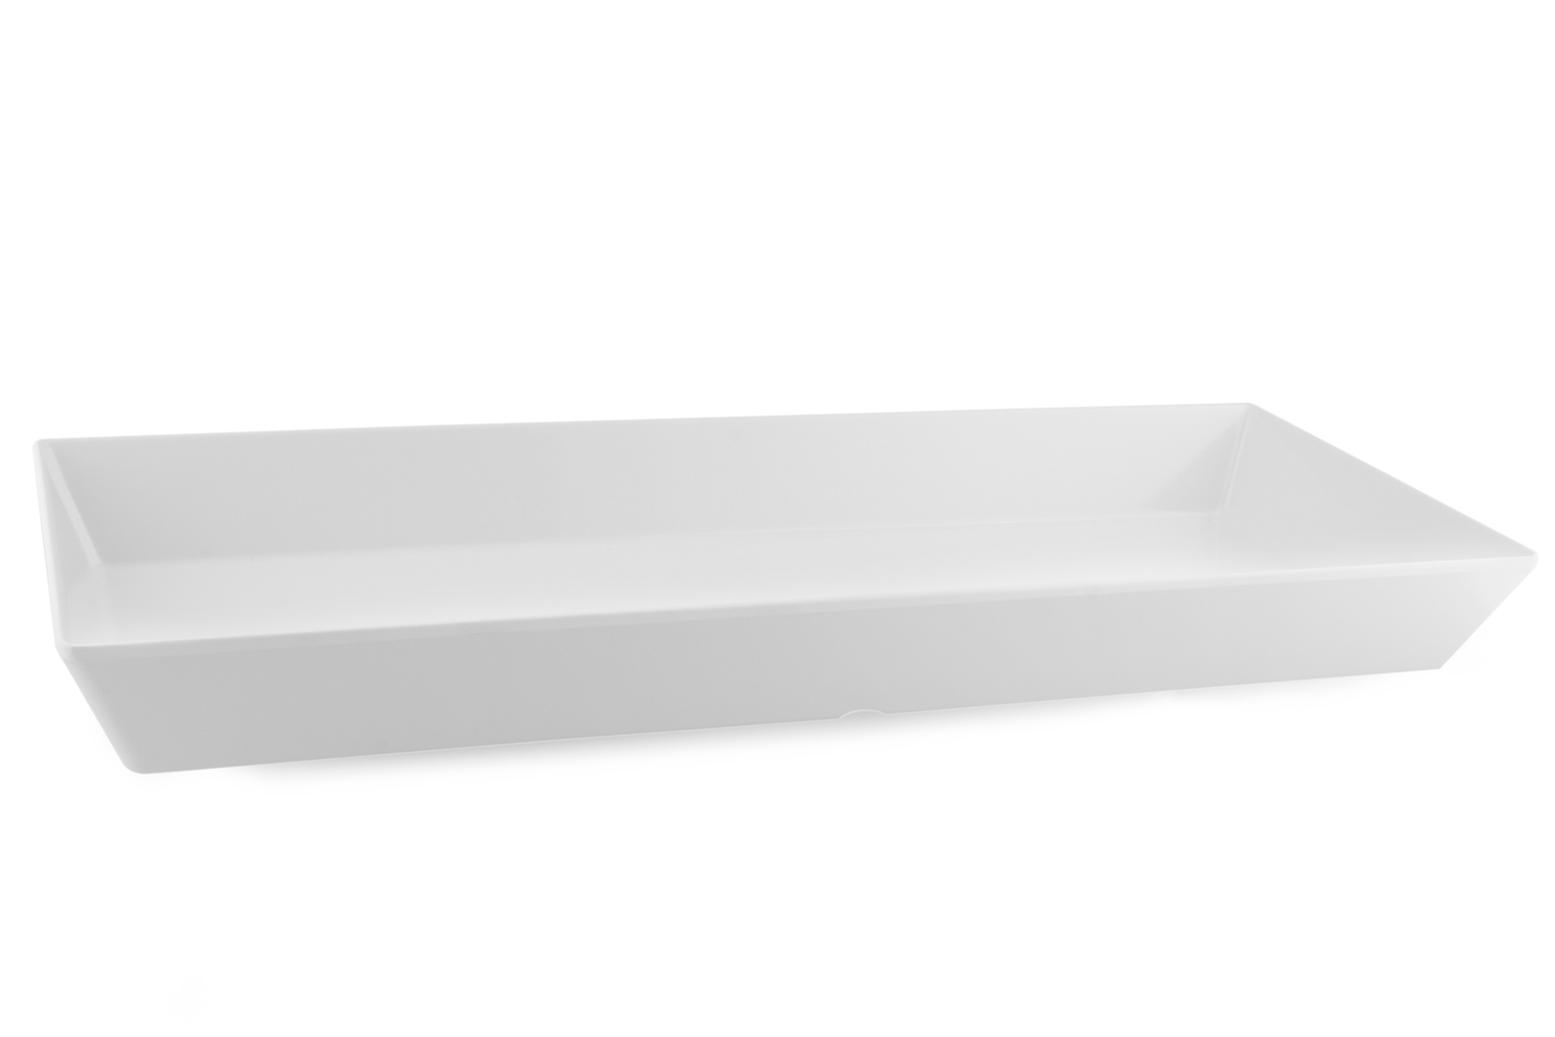 Bandeja/Fuente blanca rectangular 50x20x4